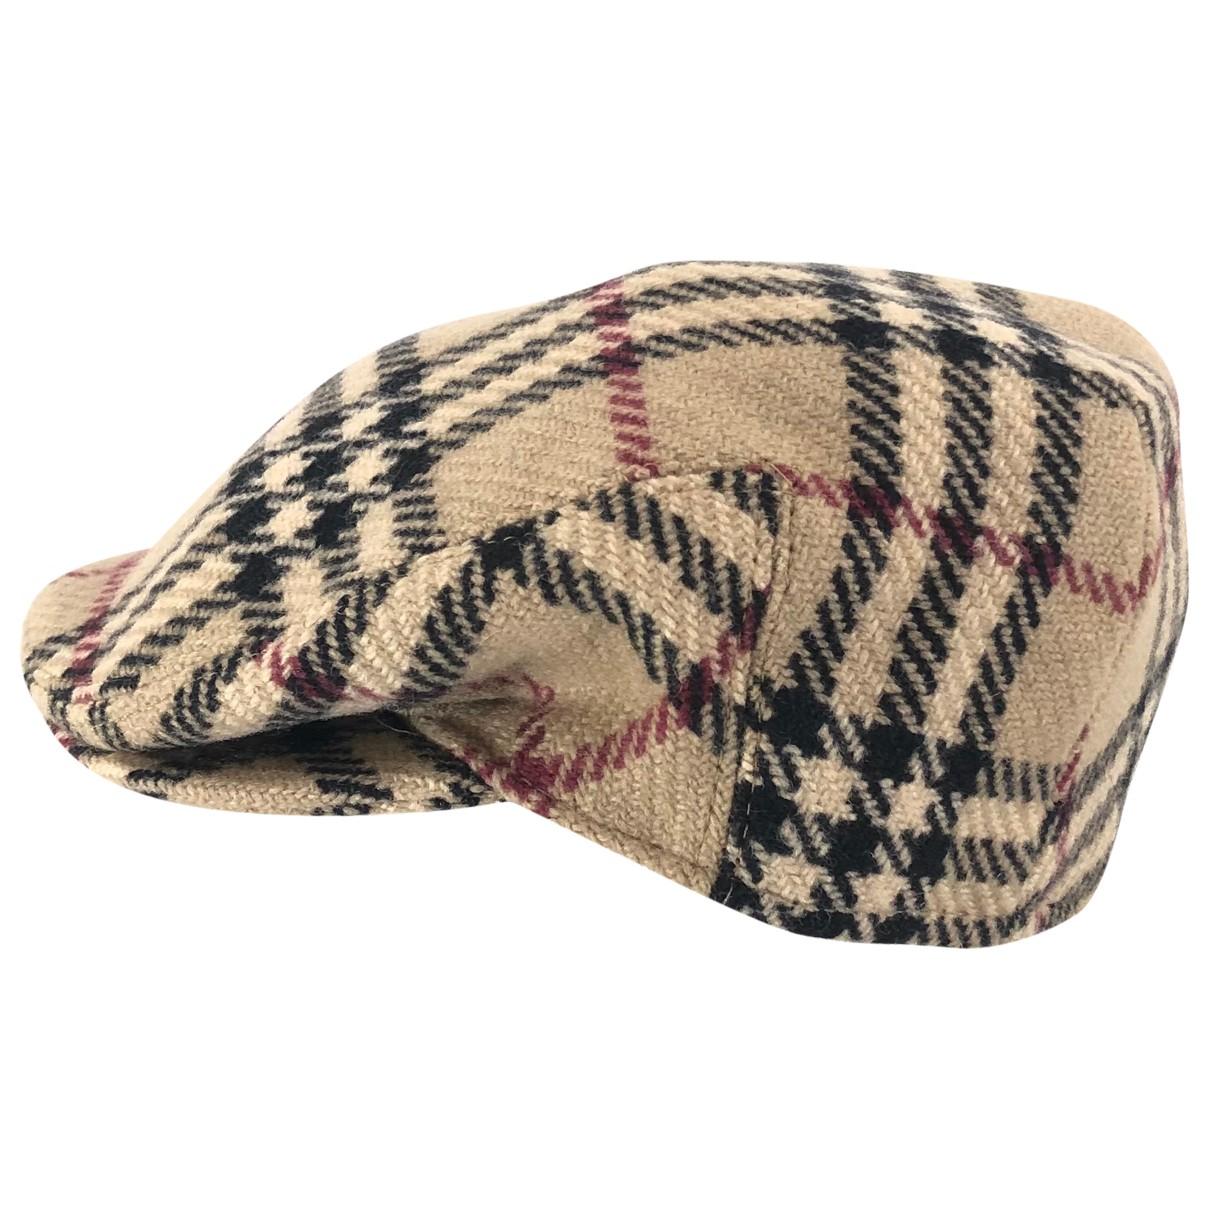 Burberry \N Hut, Muetzen in  Beige Wolle